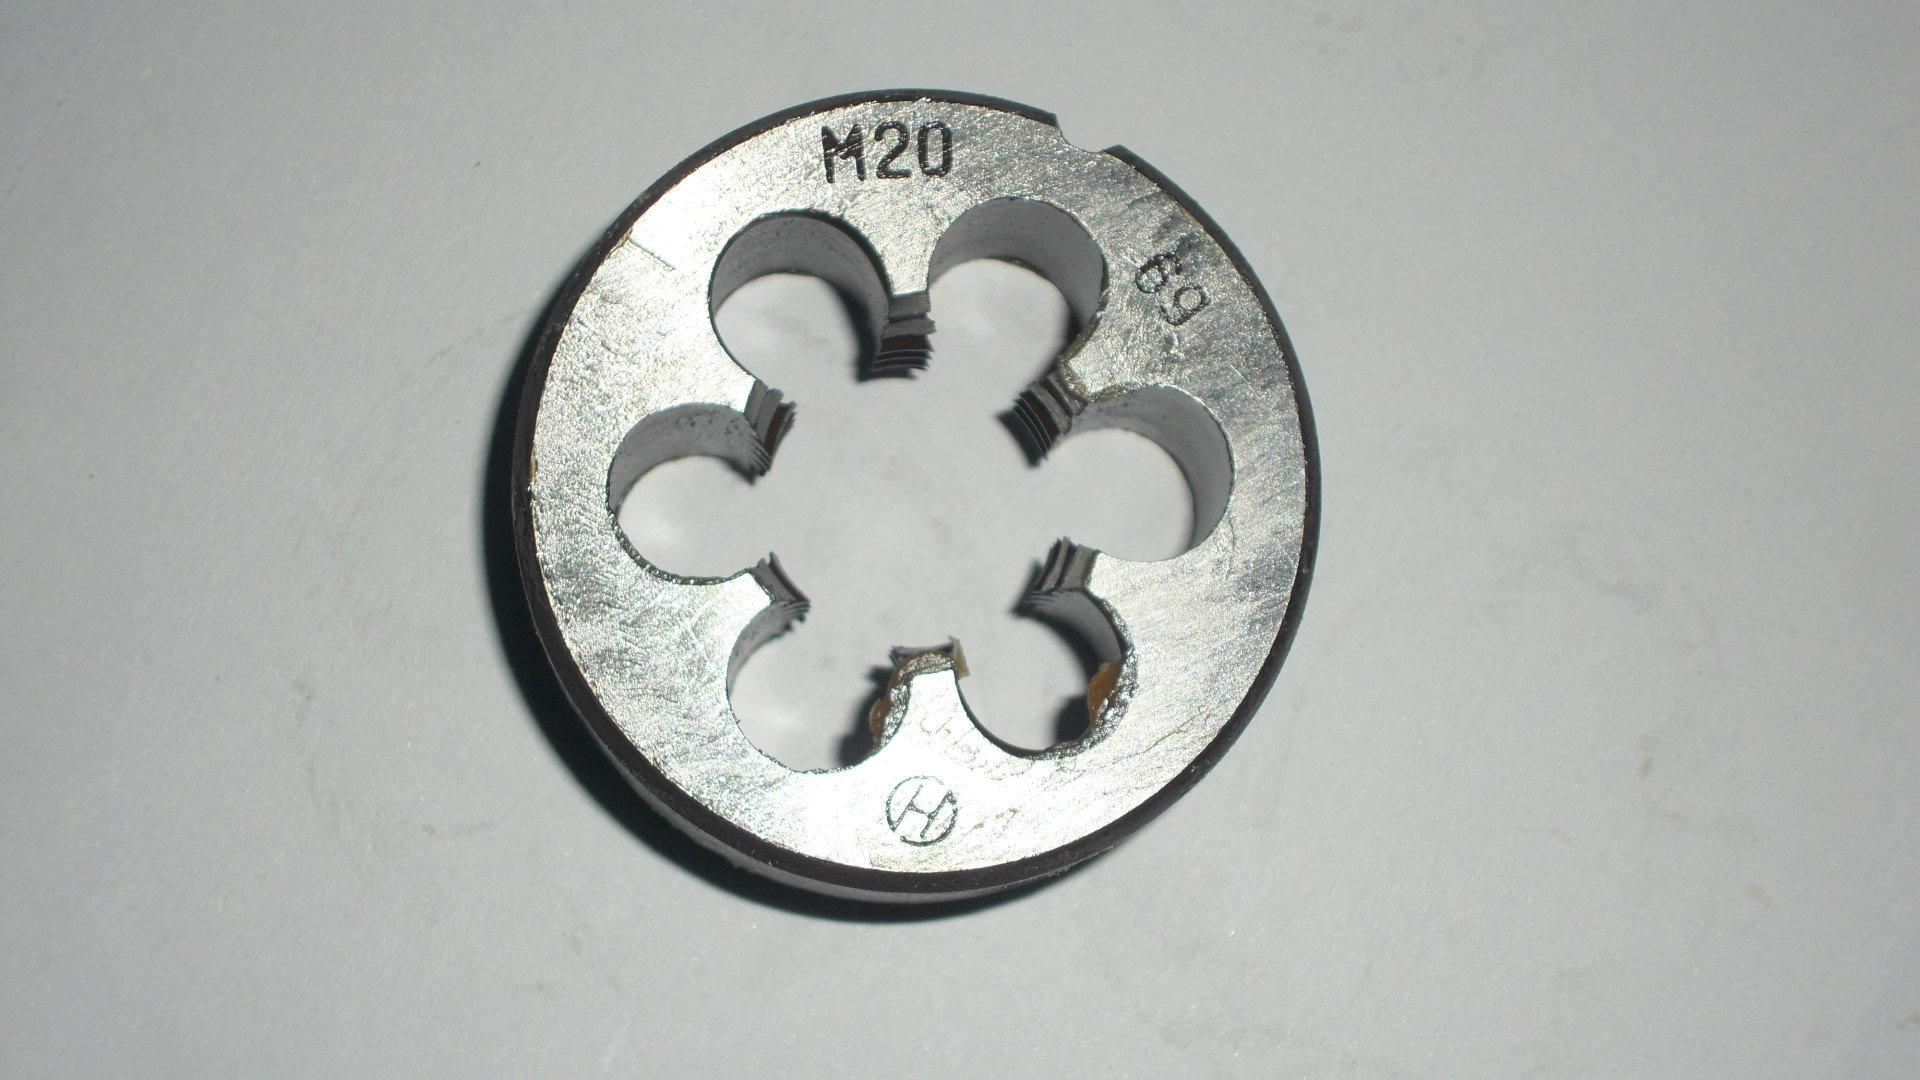 HSS Metric Round Dies